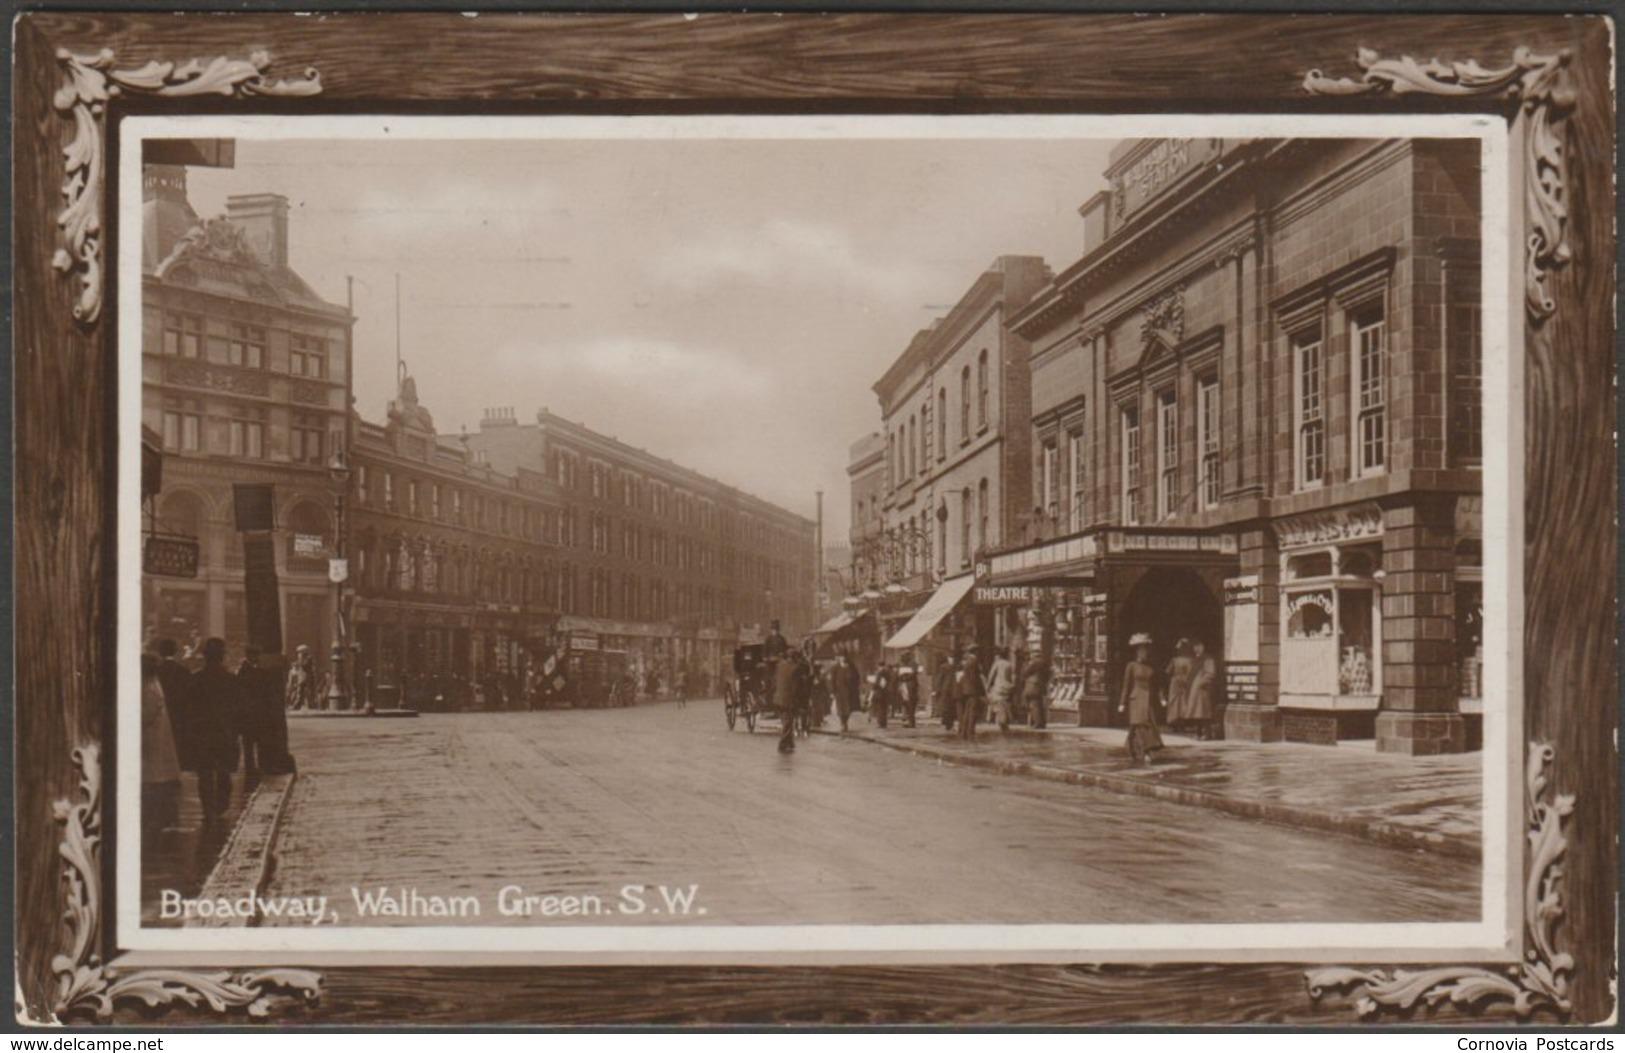 Broadway, Walham Green, London, 1911 - Temperton RP Postcard - London Suburbs